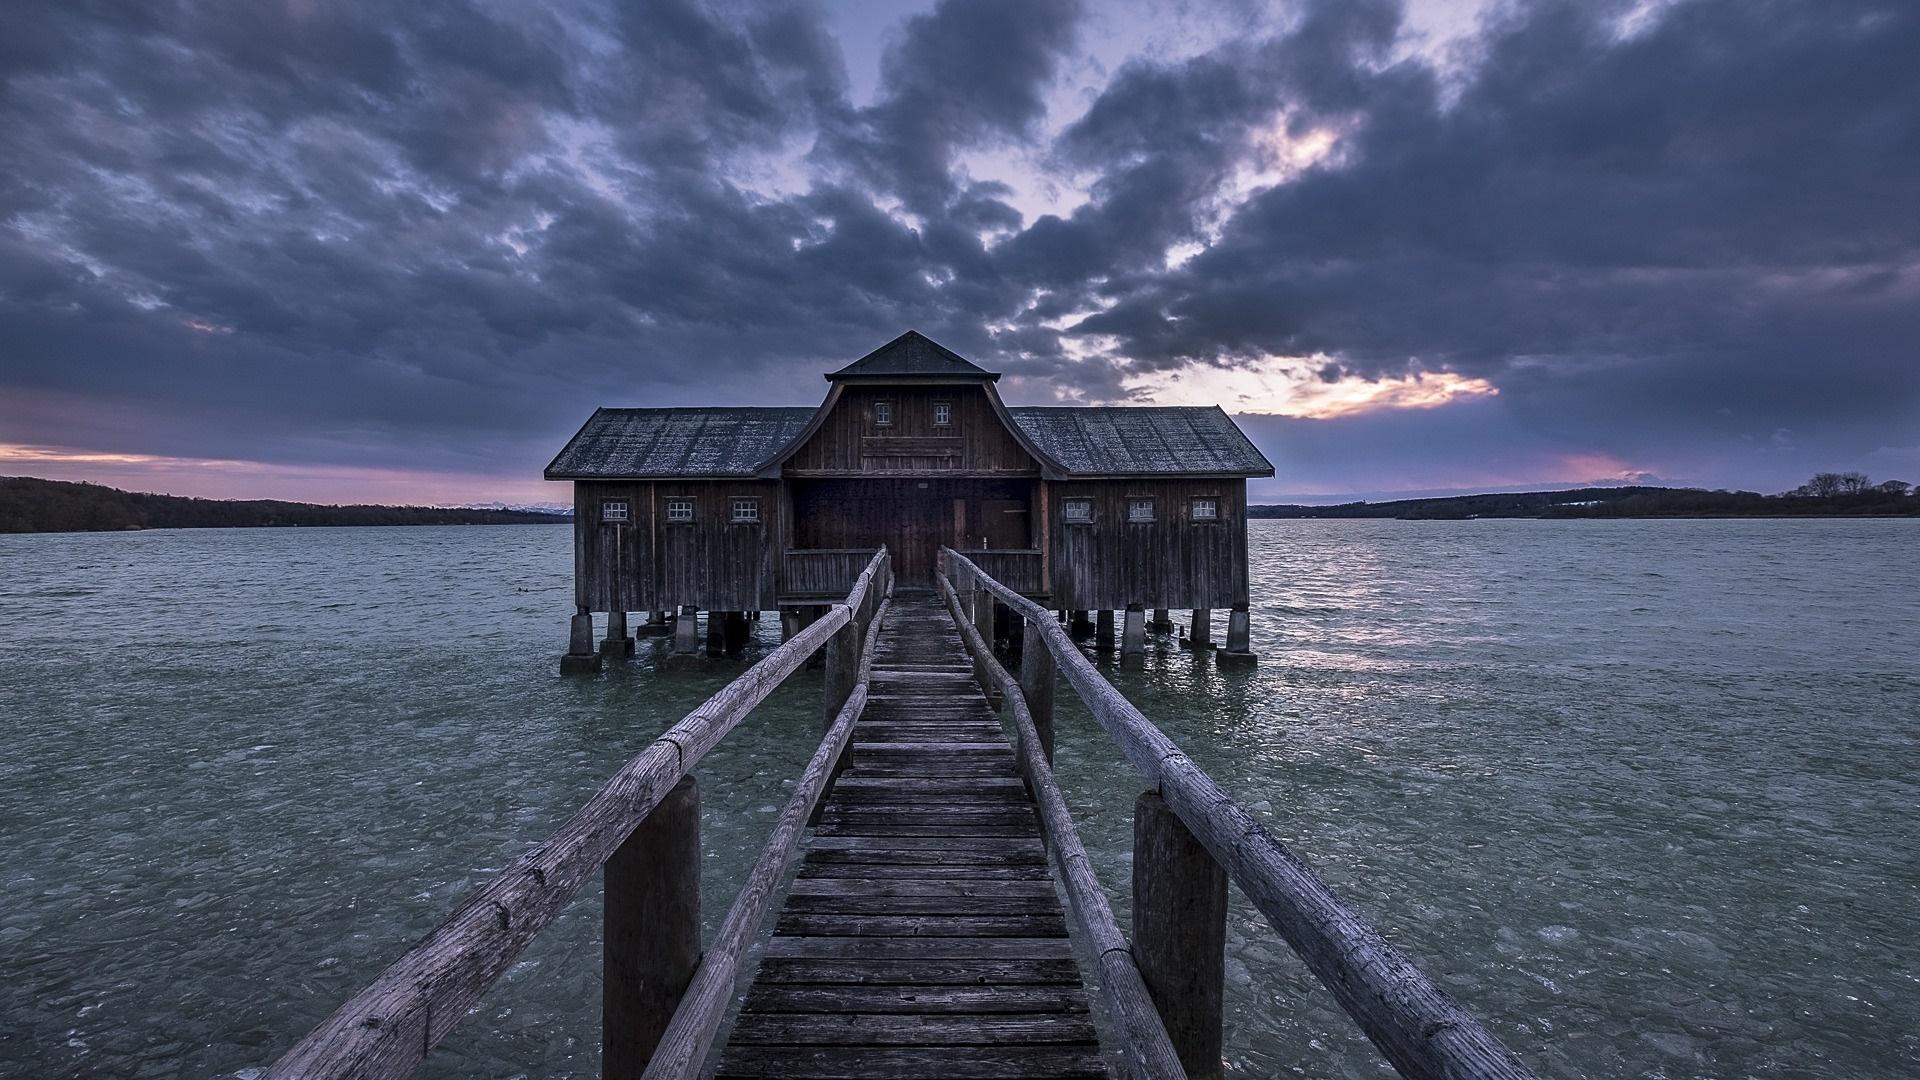 Boathouse on Lake Ammerse wallpaper